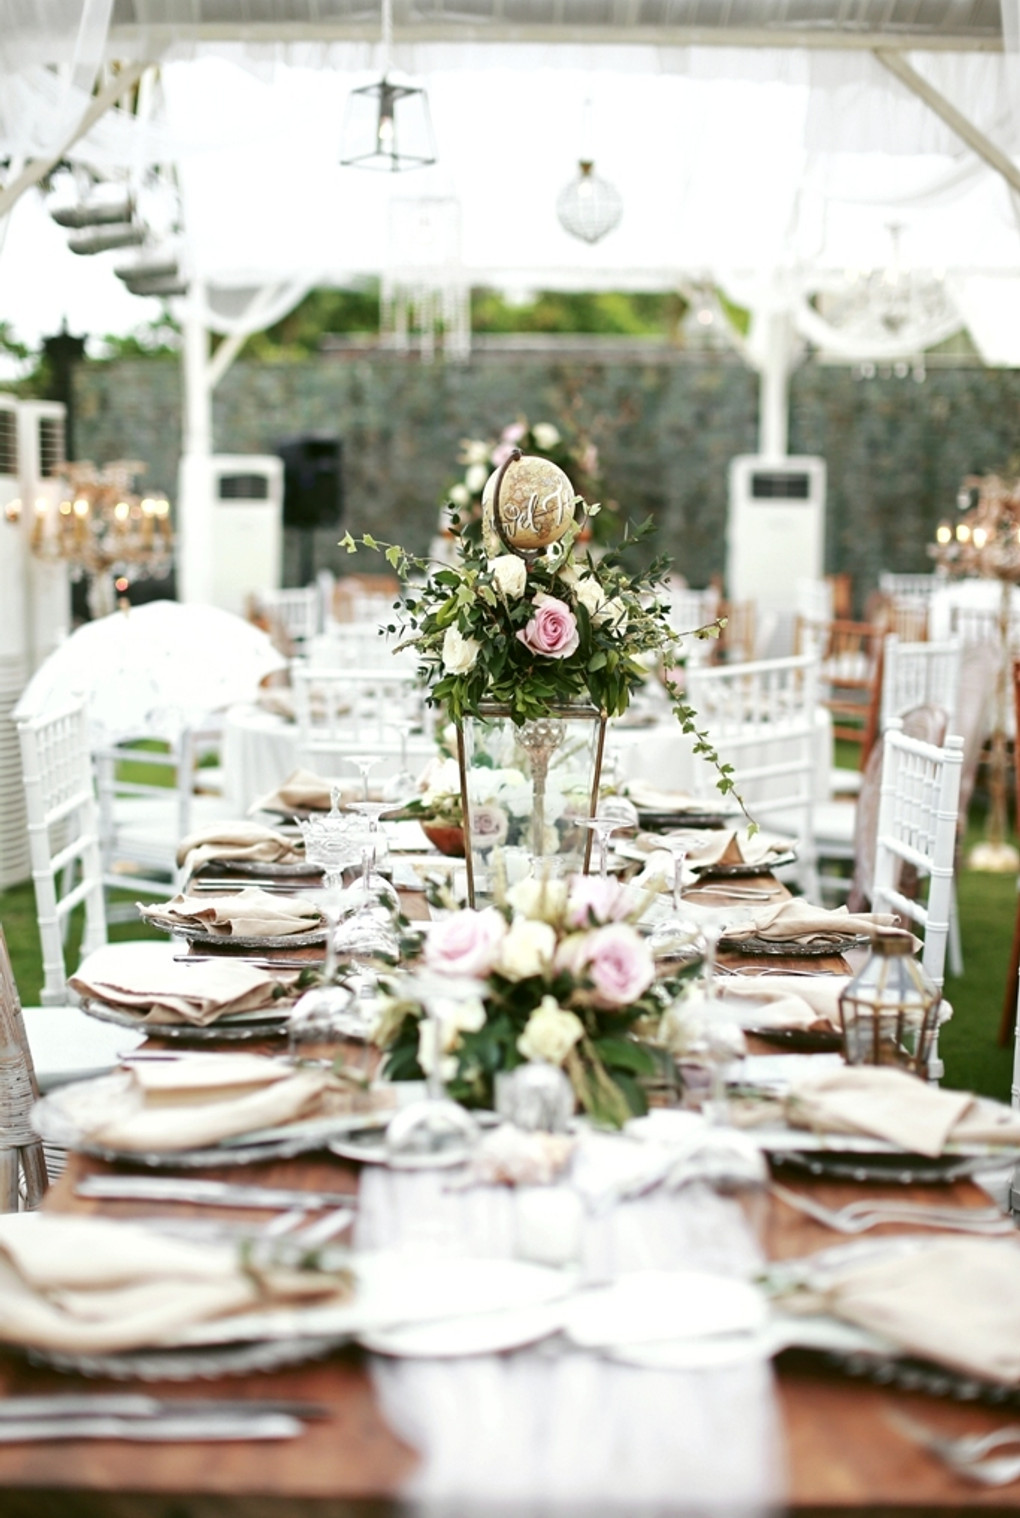 A Travel Themed Wedding In Bali With Rustic Elegant Decor